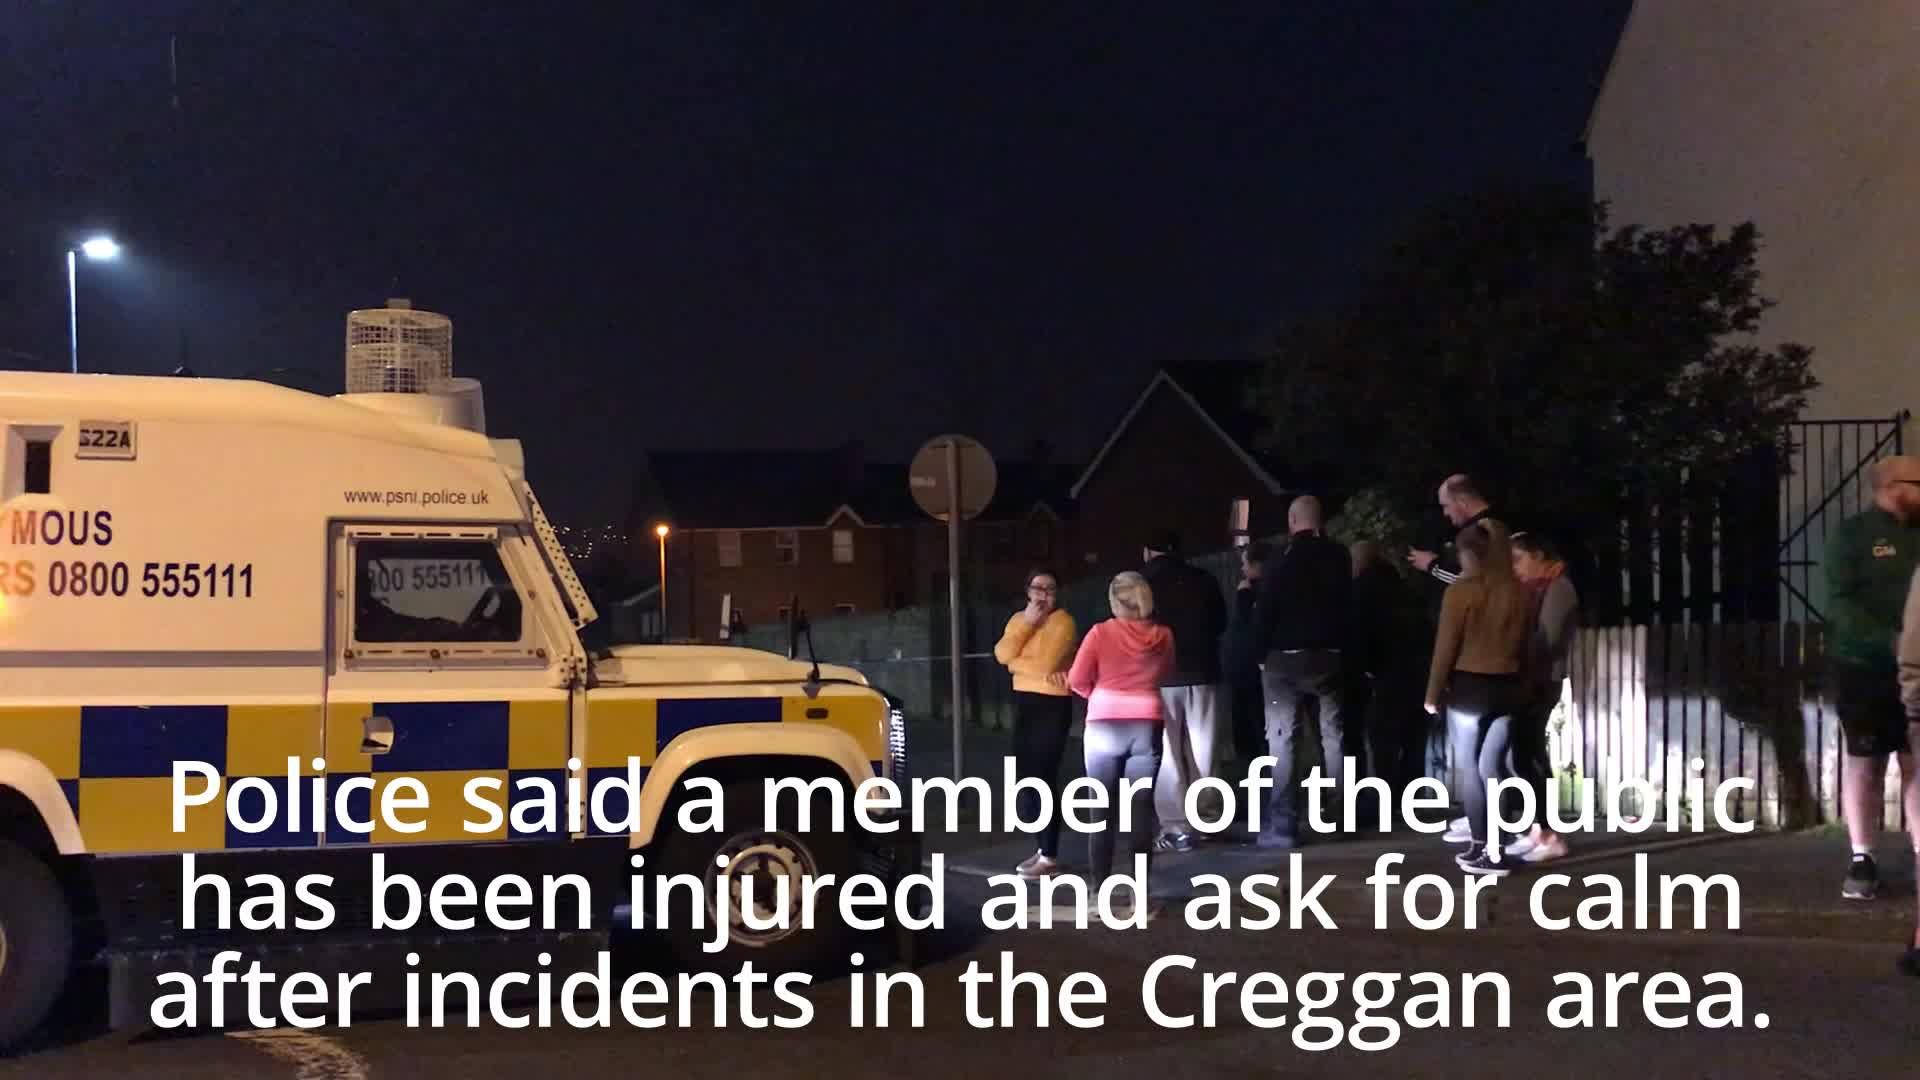 Northern Ireland Unrest: Woman, 29, Shot Dead In Creggan, Londonderry 'Terrorist Incident', Police Say